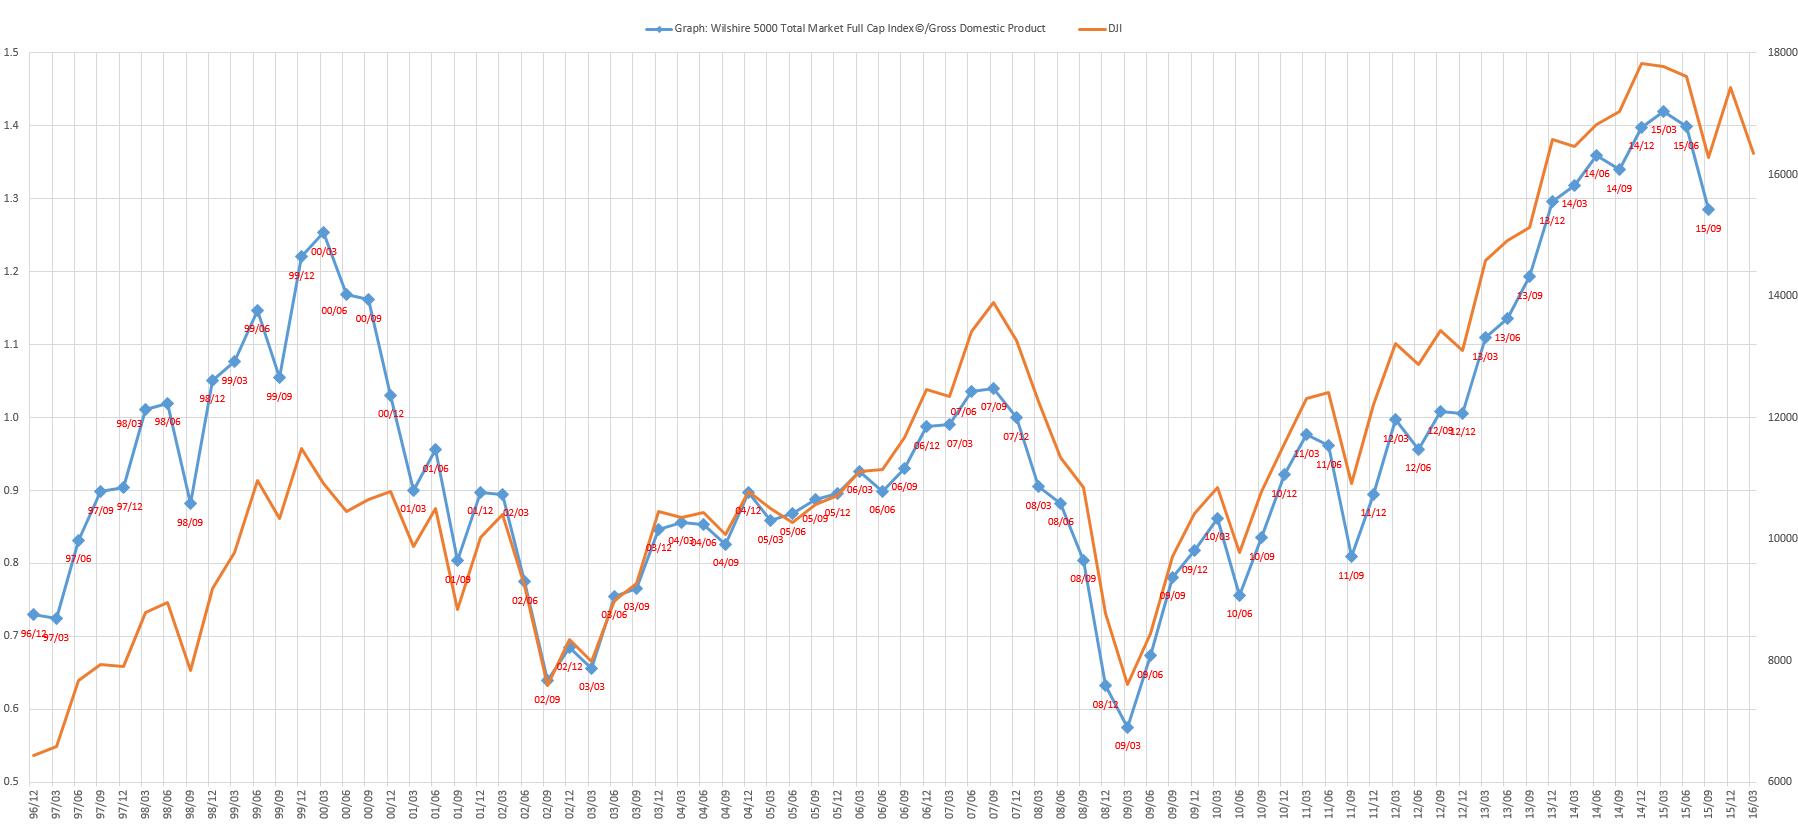 JP Global Capital Management米国株      バフェット指数及びISM製造業景気指数の推移    コメントトラックバック